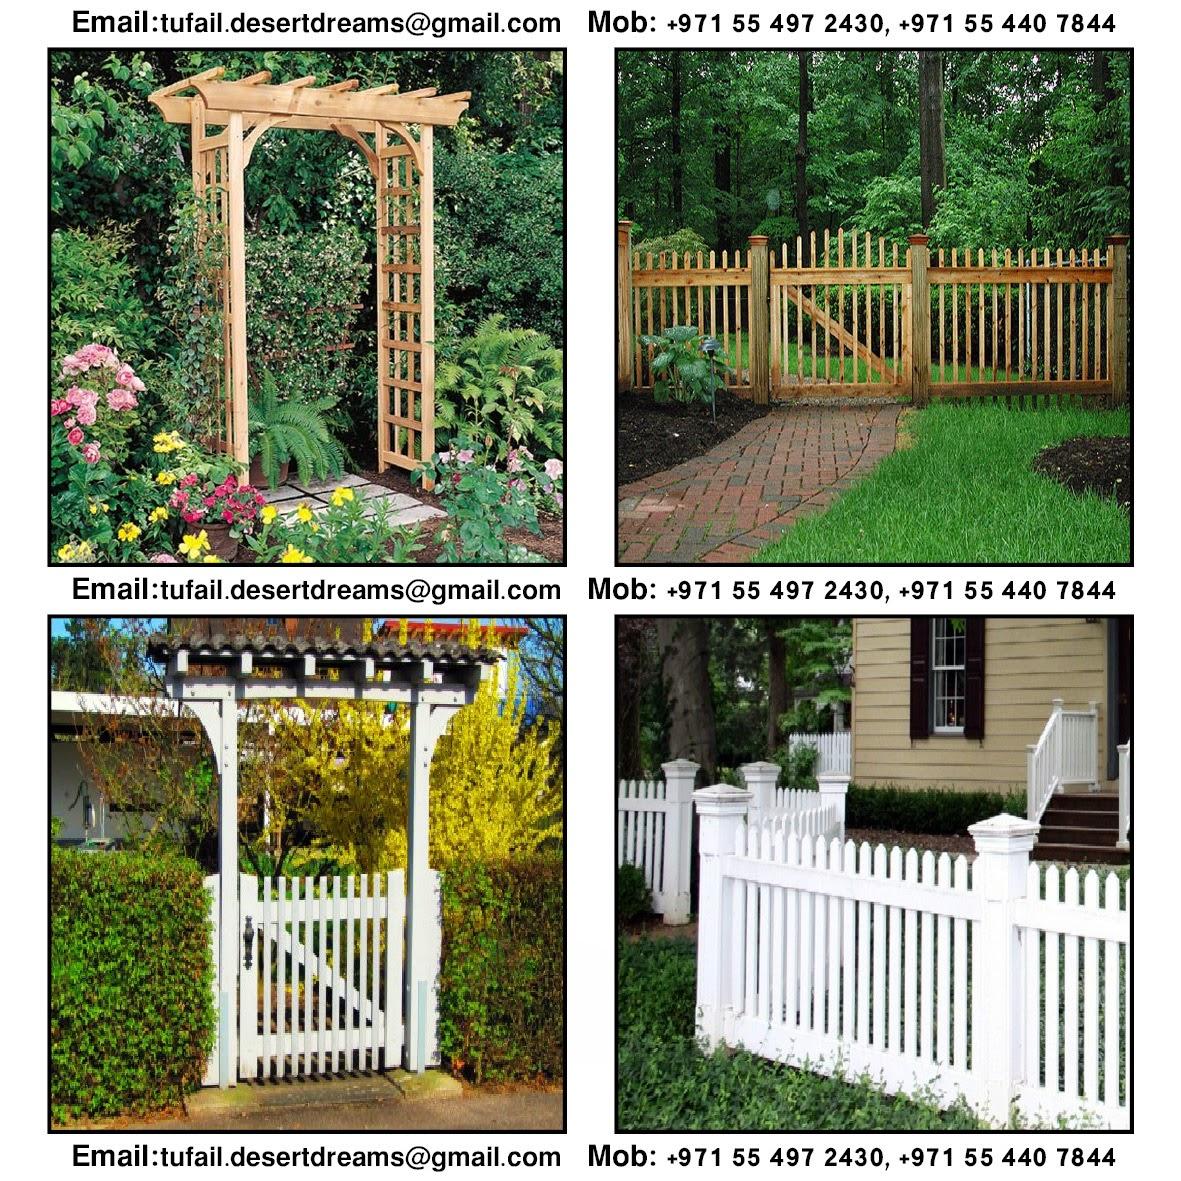 Picket fence westchester picket walpole design innovative creative wooden garden fence gates doors by arab garden in uae baanklon Image collections